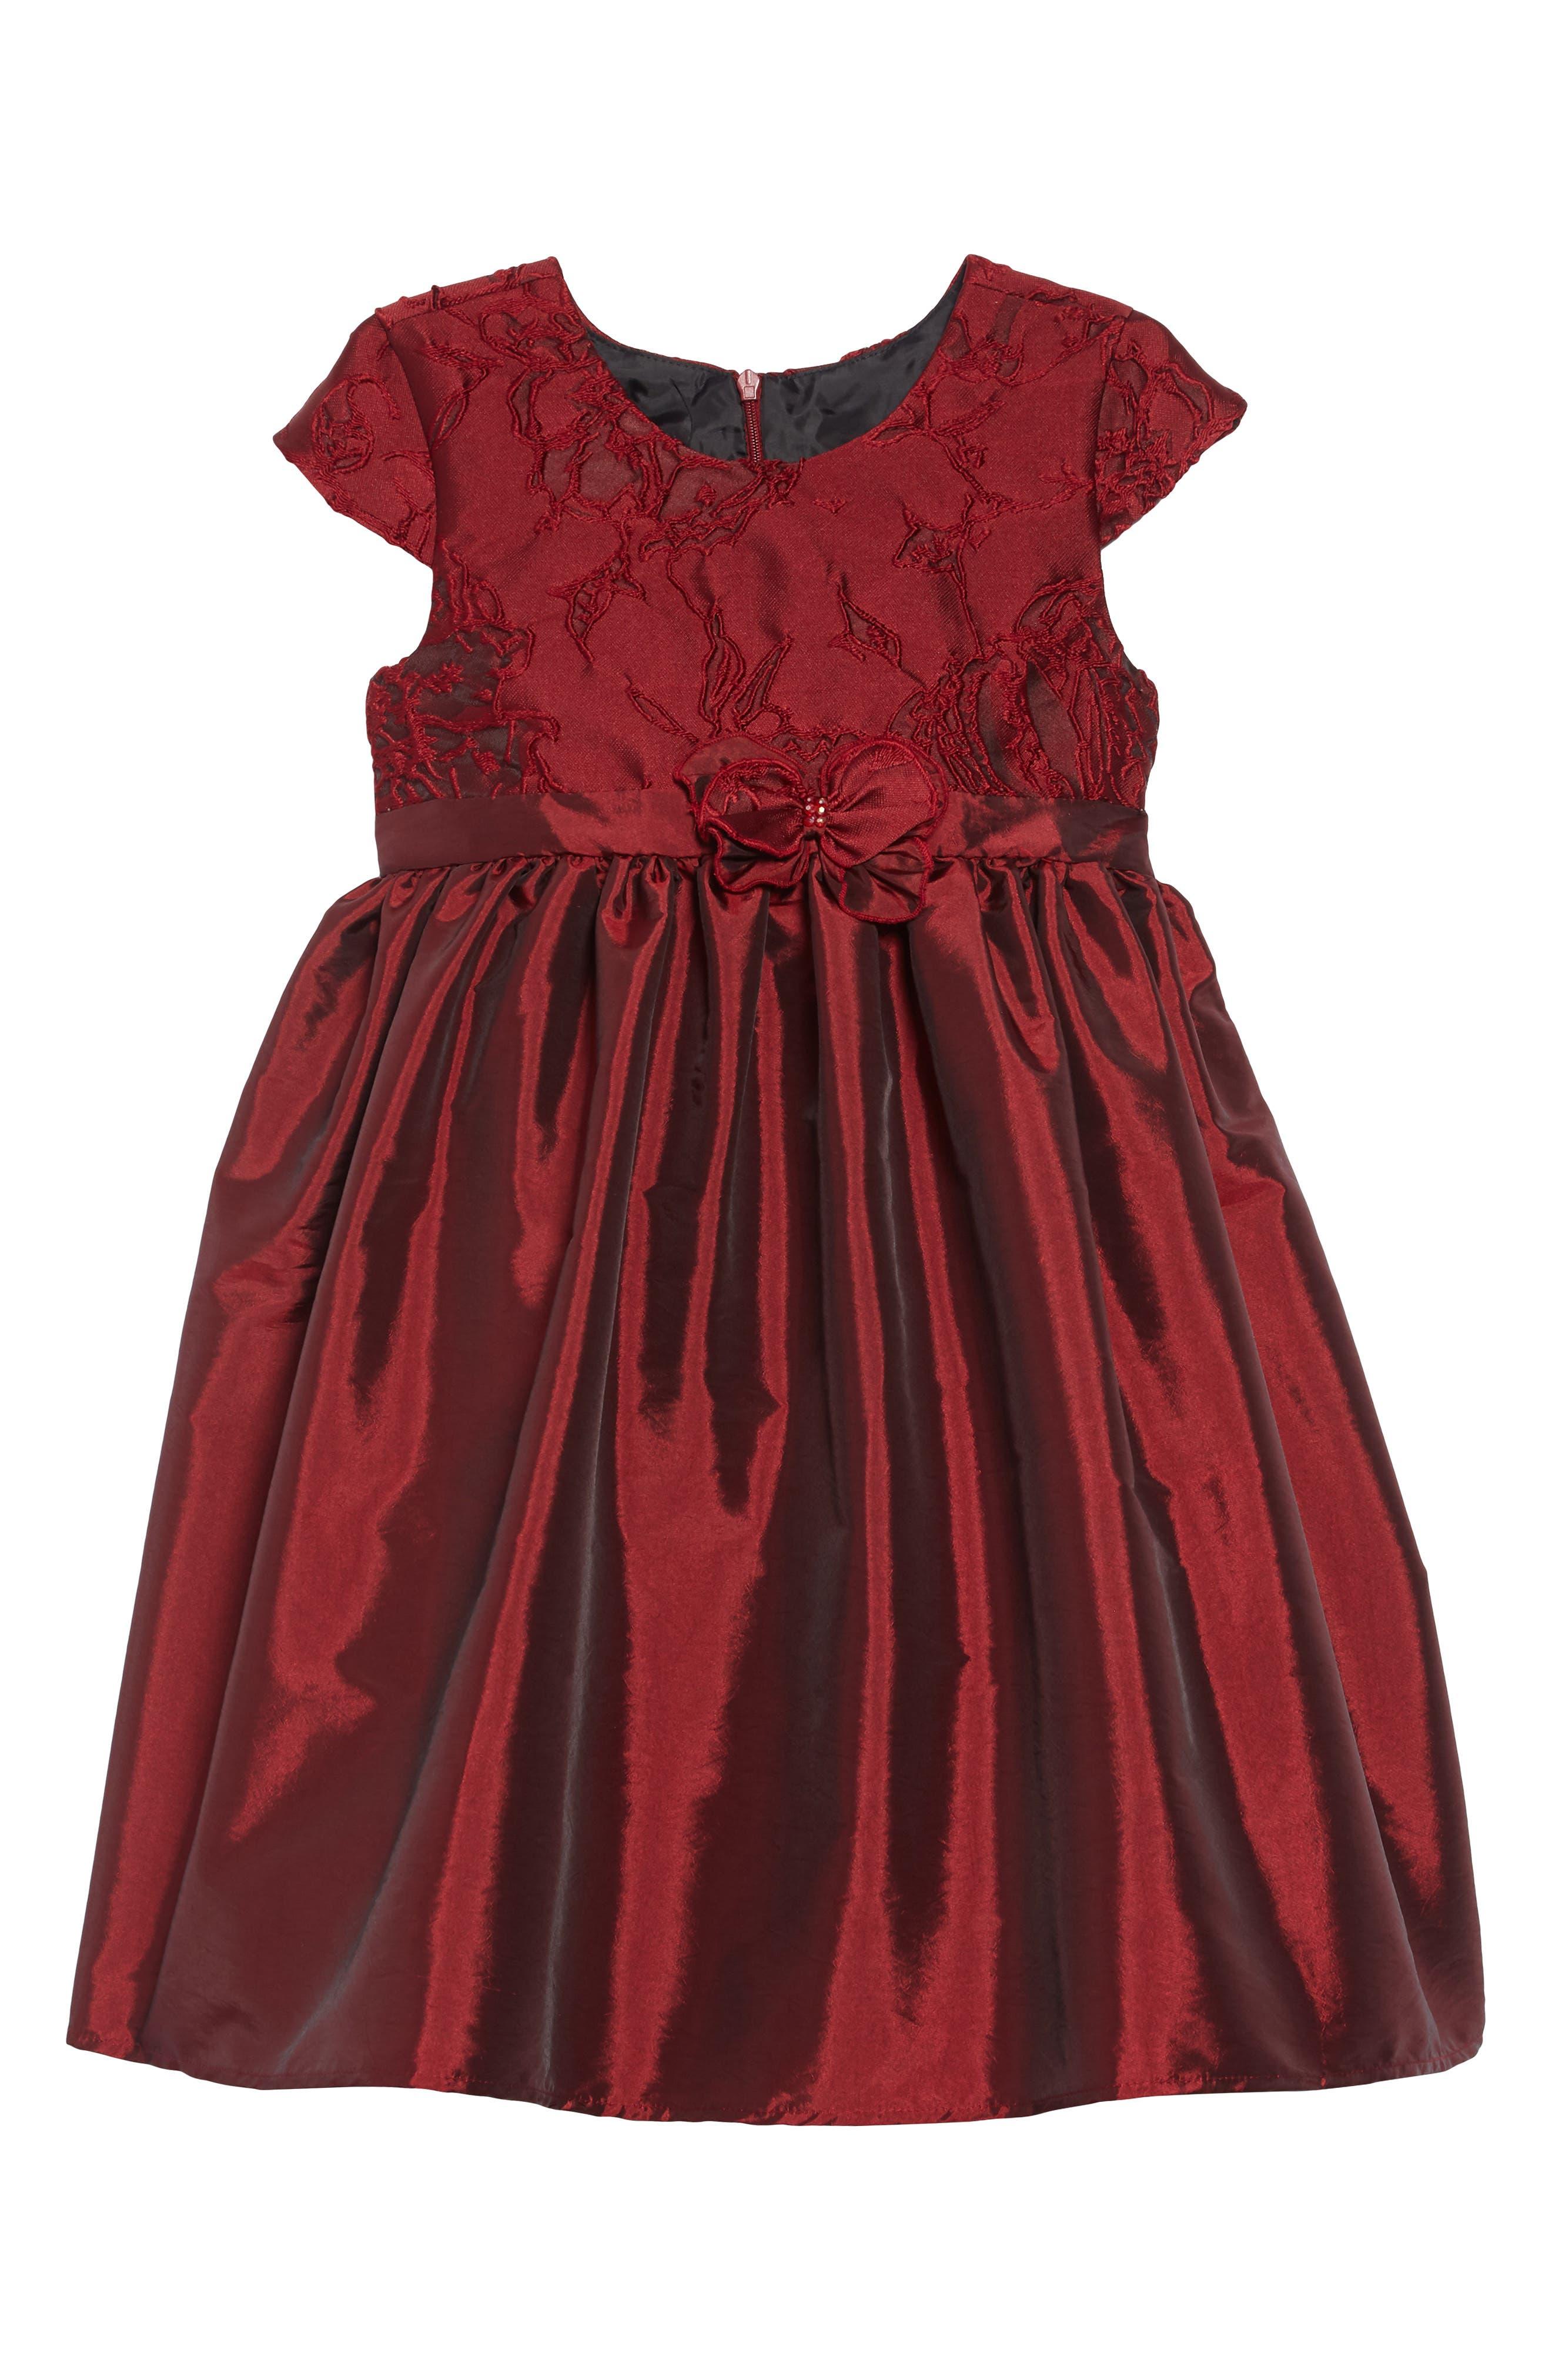 Ruby Spice Lace & Taffeta Dress,                             Main thumbnail 1, color,                             BURGUNDY